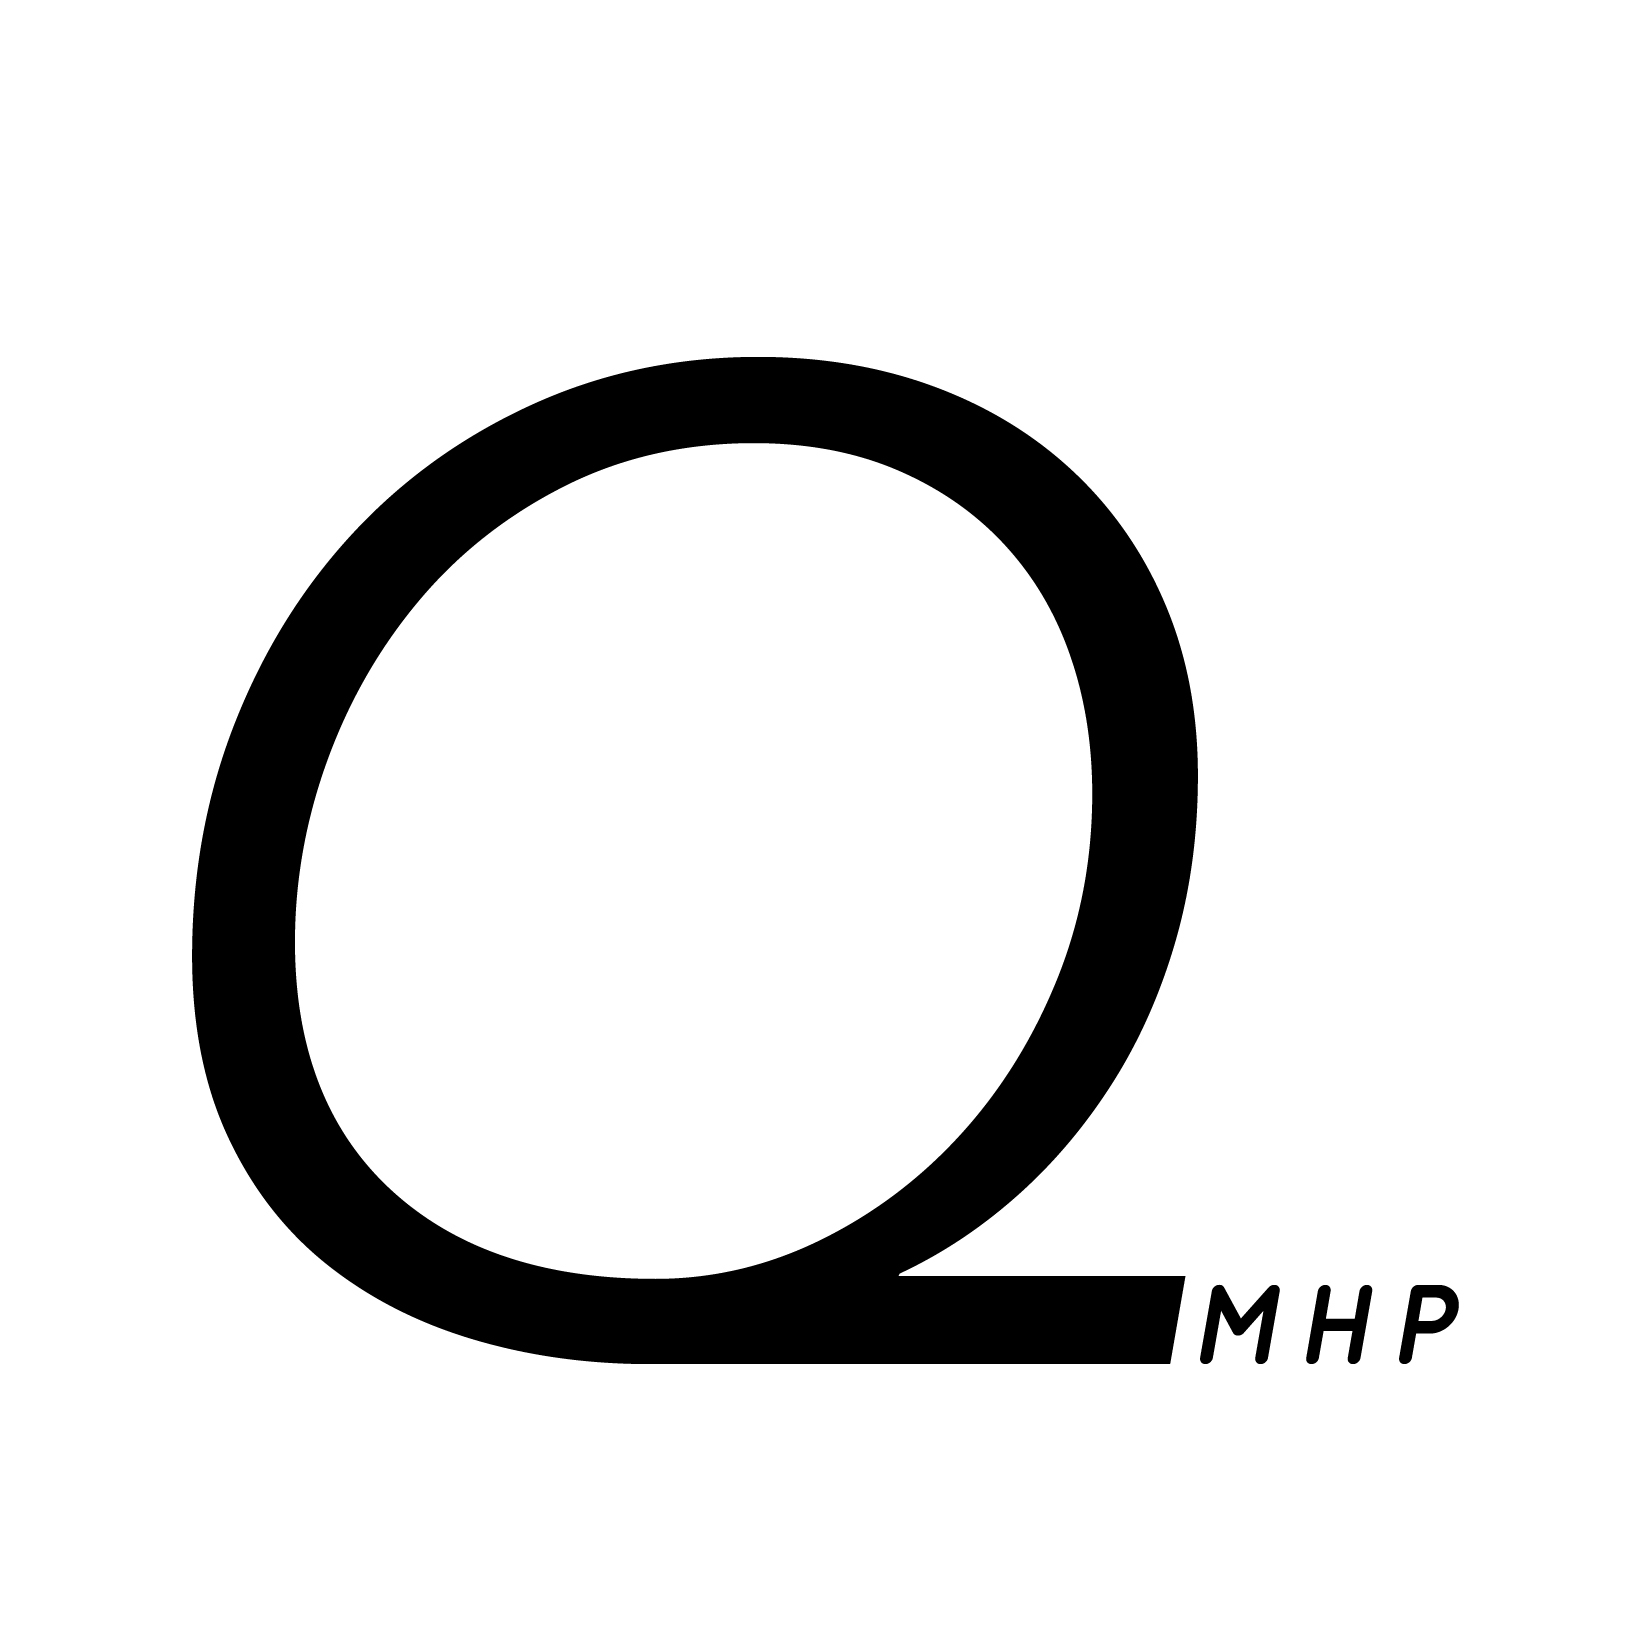 mhpq logo.jpg